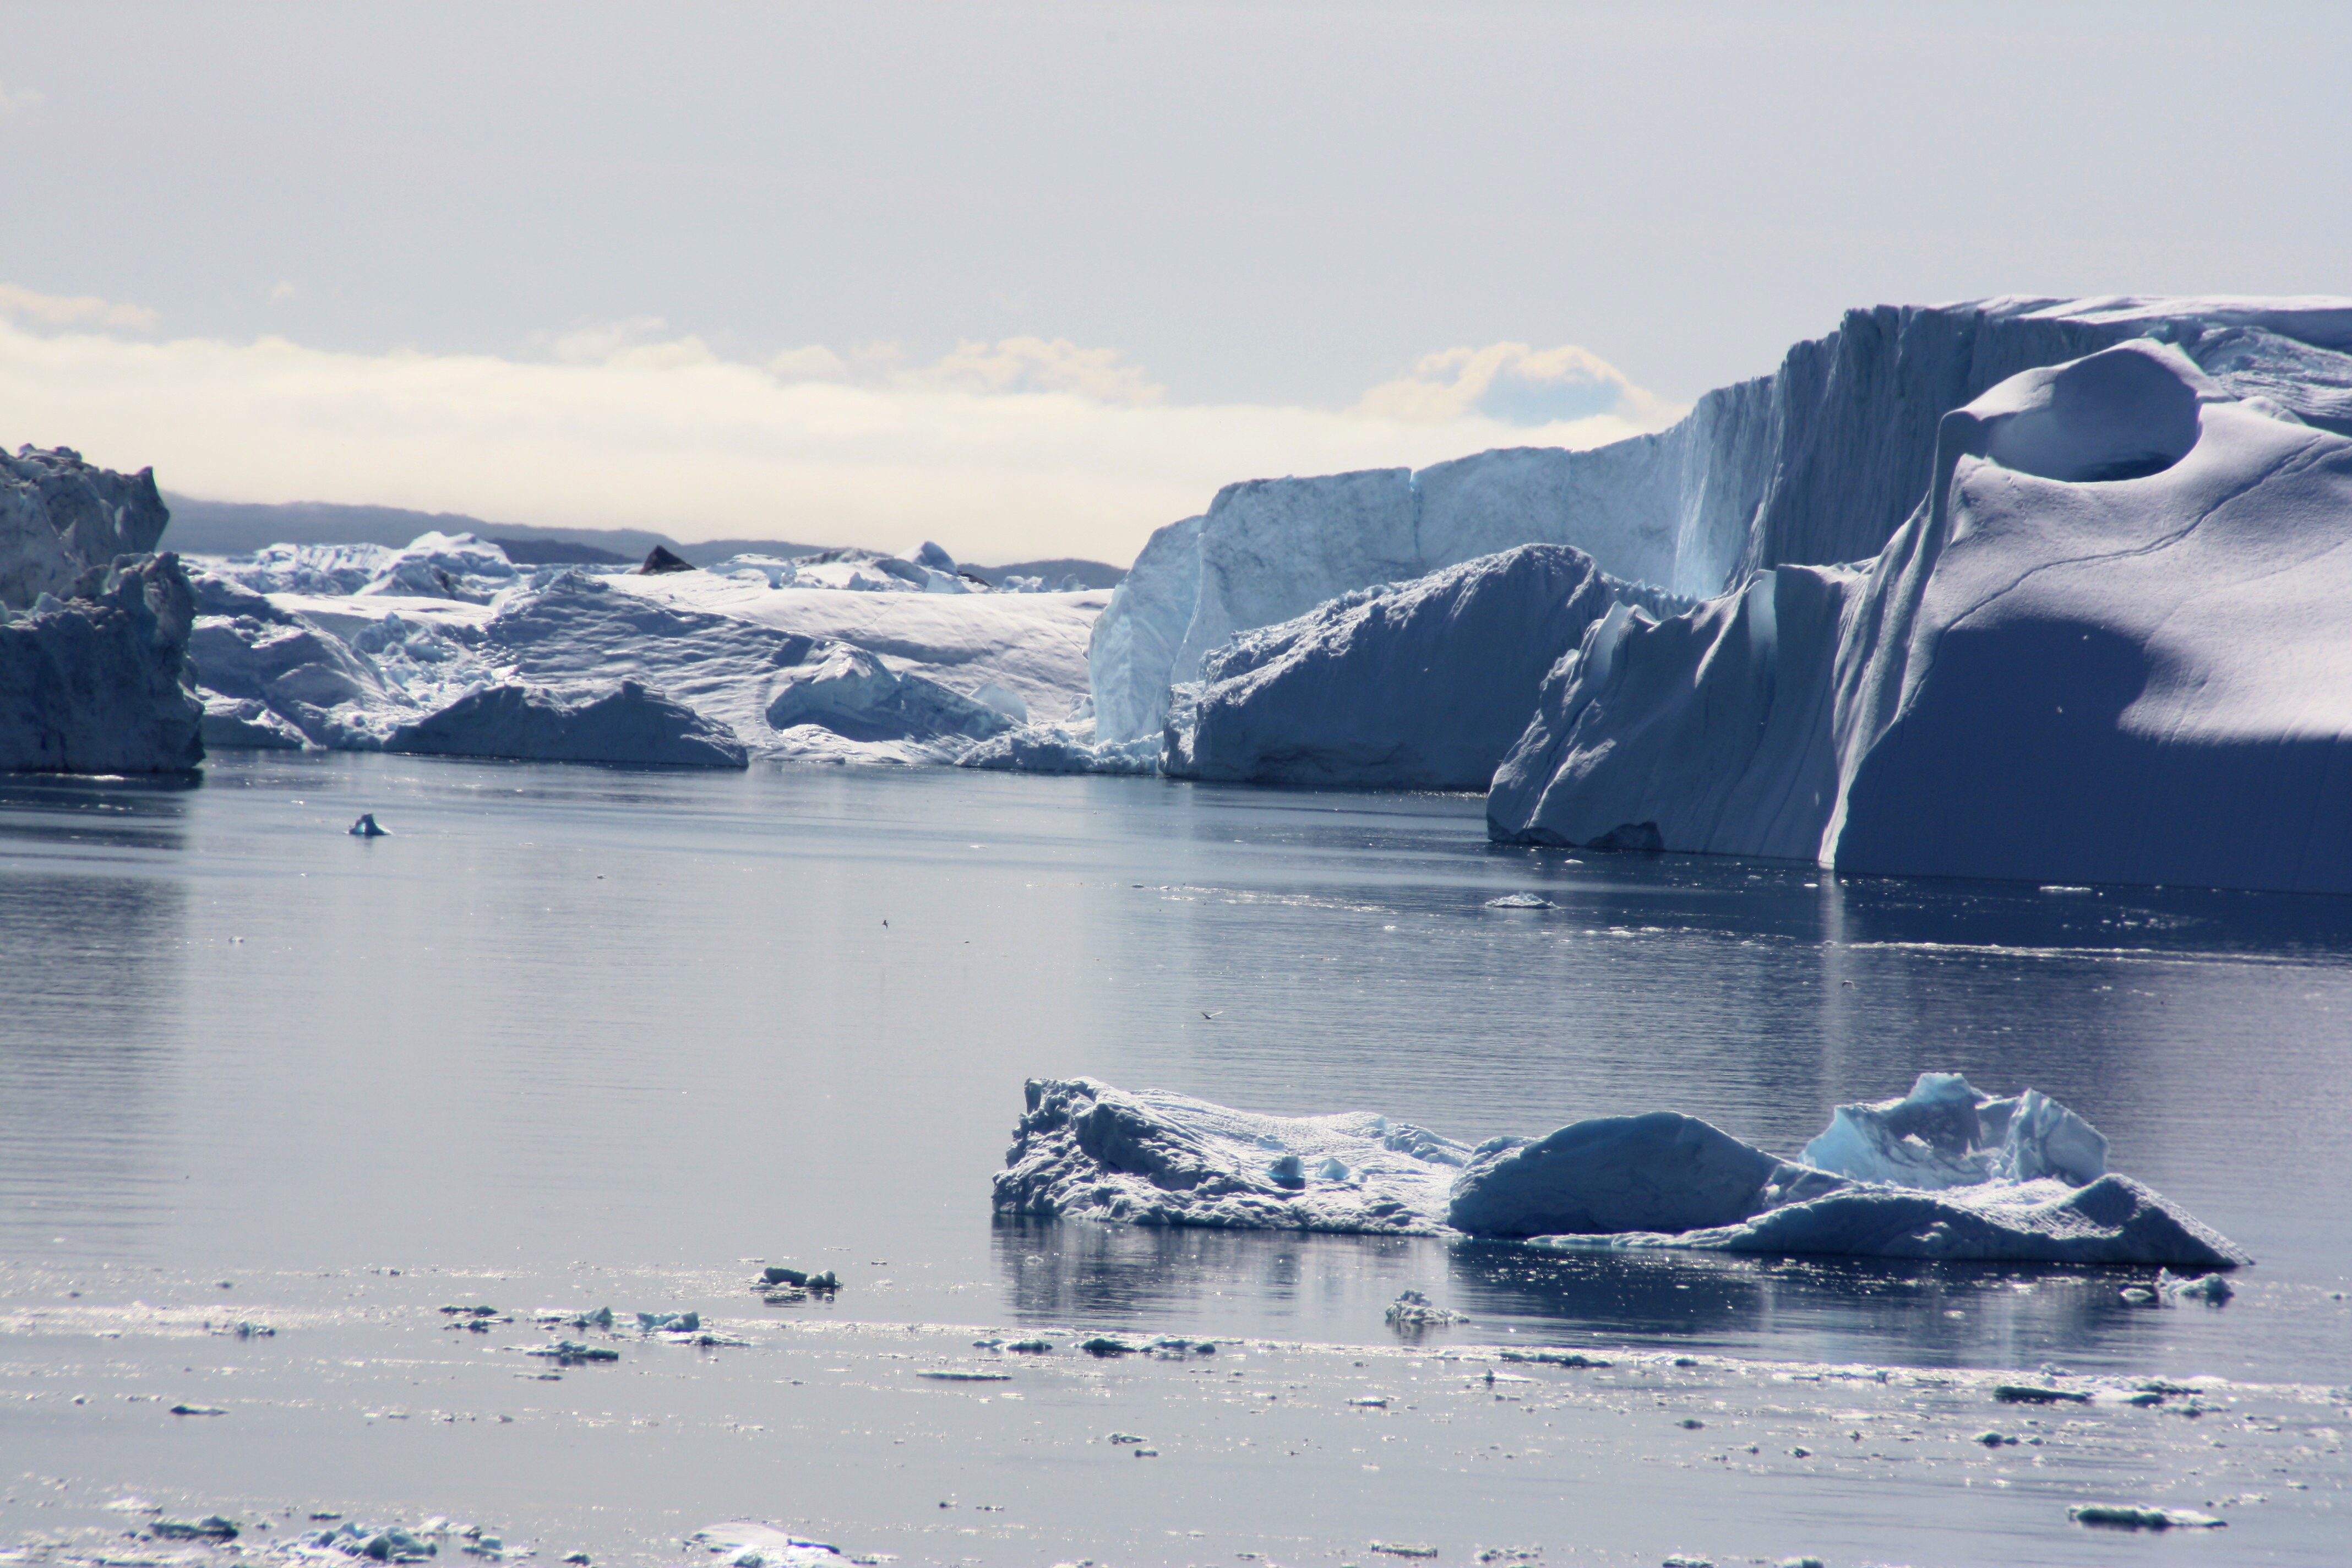 Sermeq Kujalleq glacier at Ilulissat (2009) (I.Quaile)